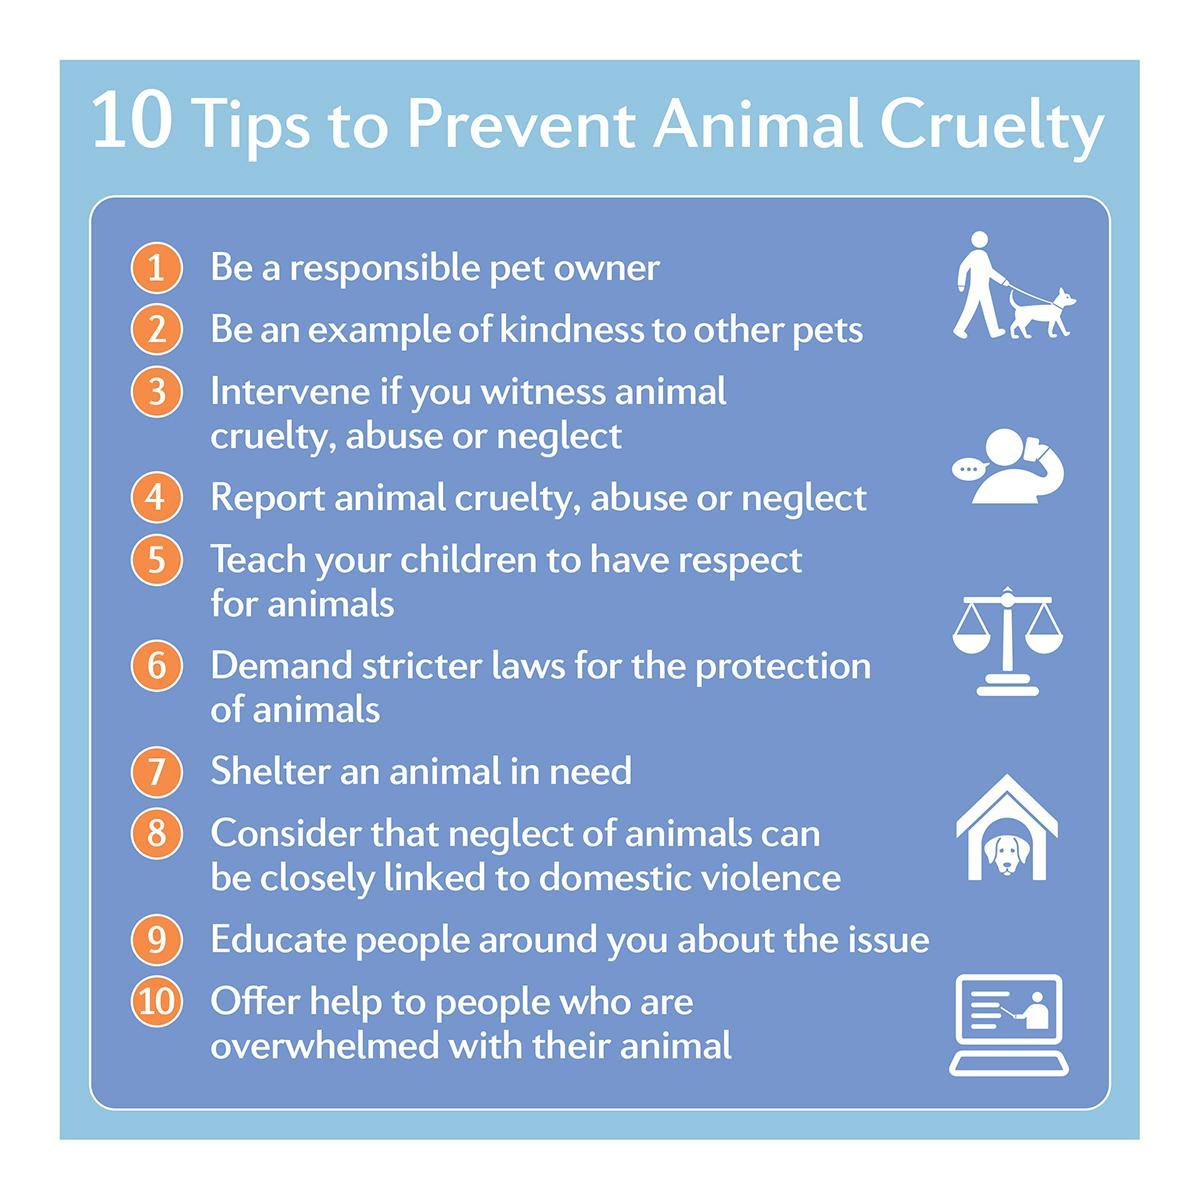 #LIVEKINDER - Prevent Animal Cruelty